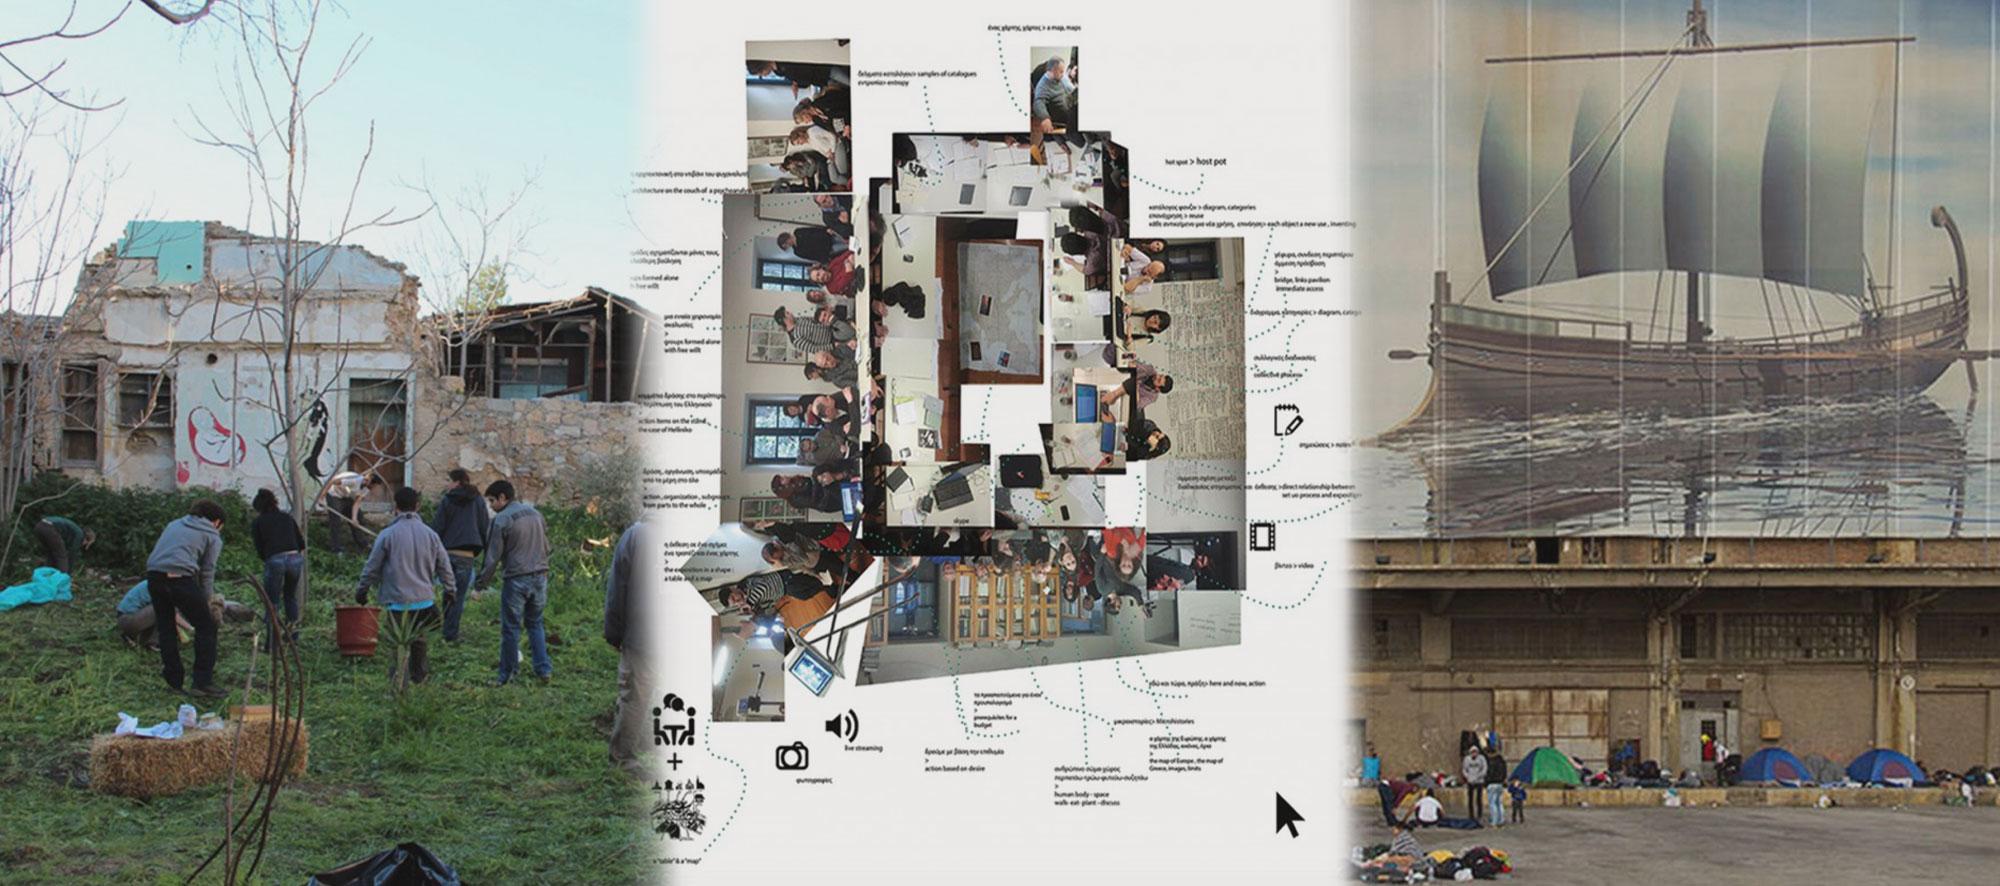 Venice-Architecture-Biennale-2016-1